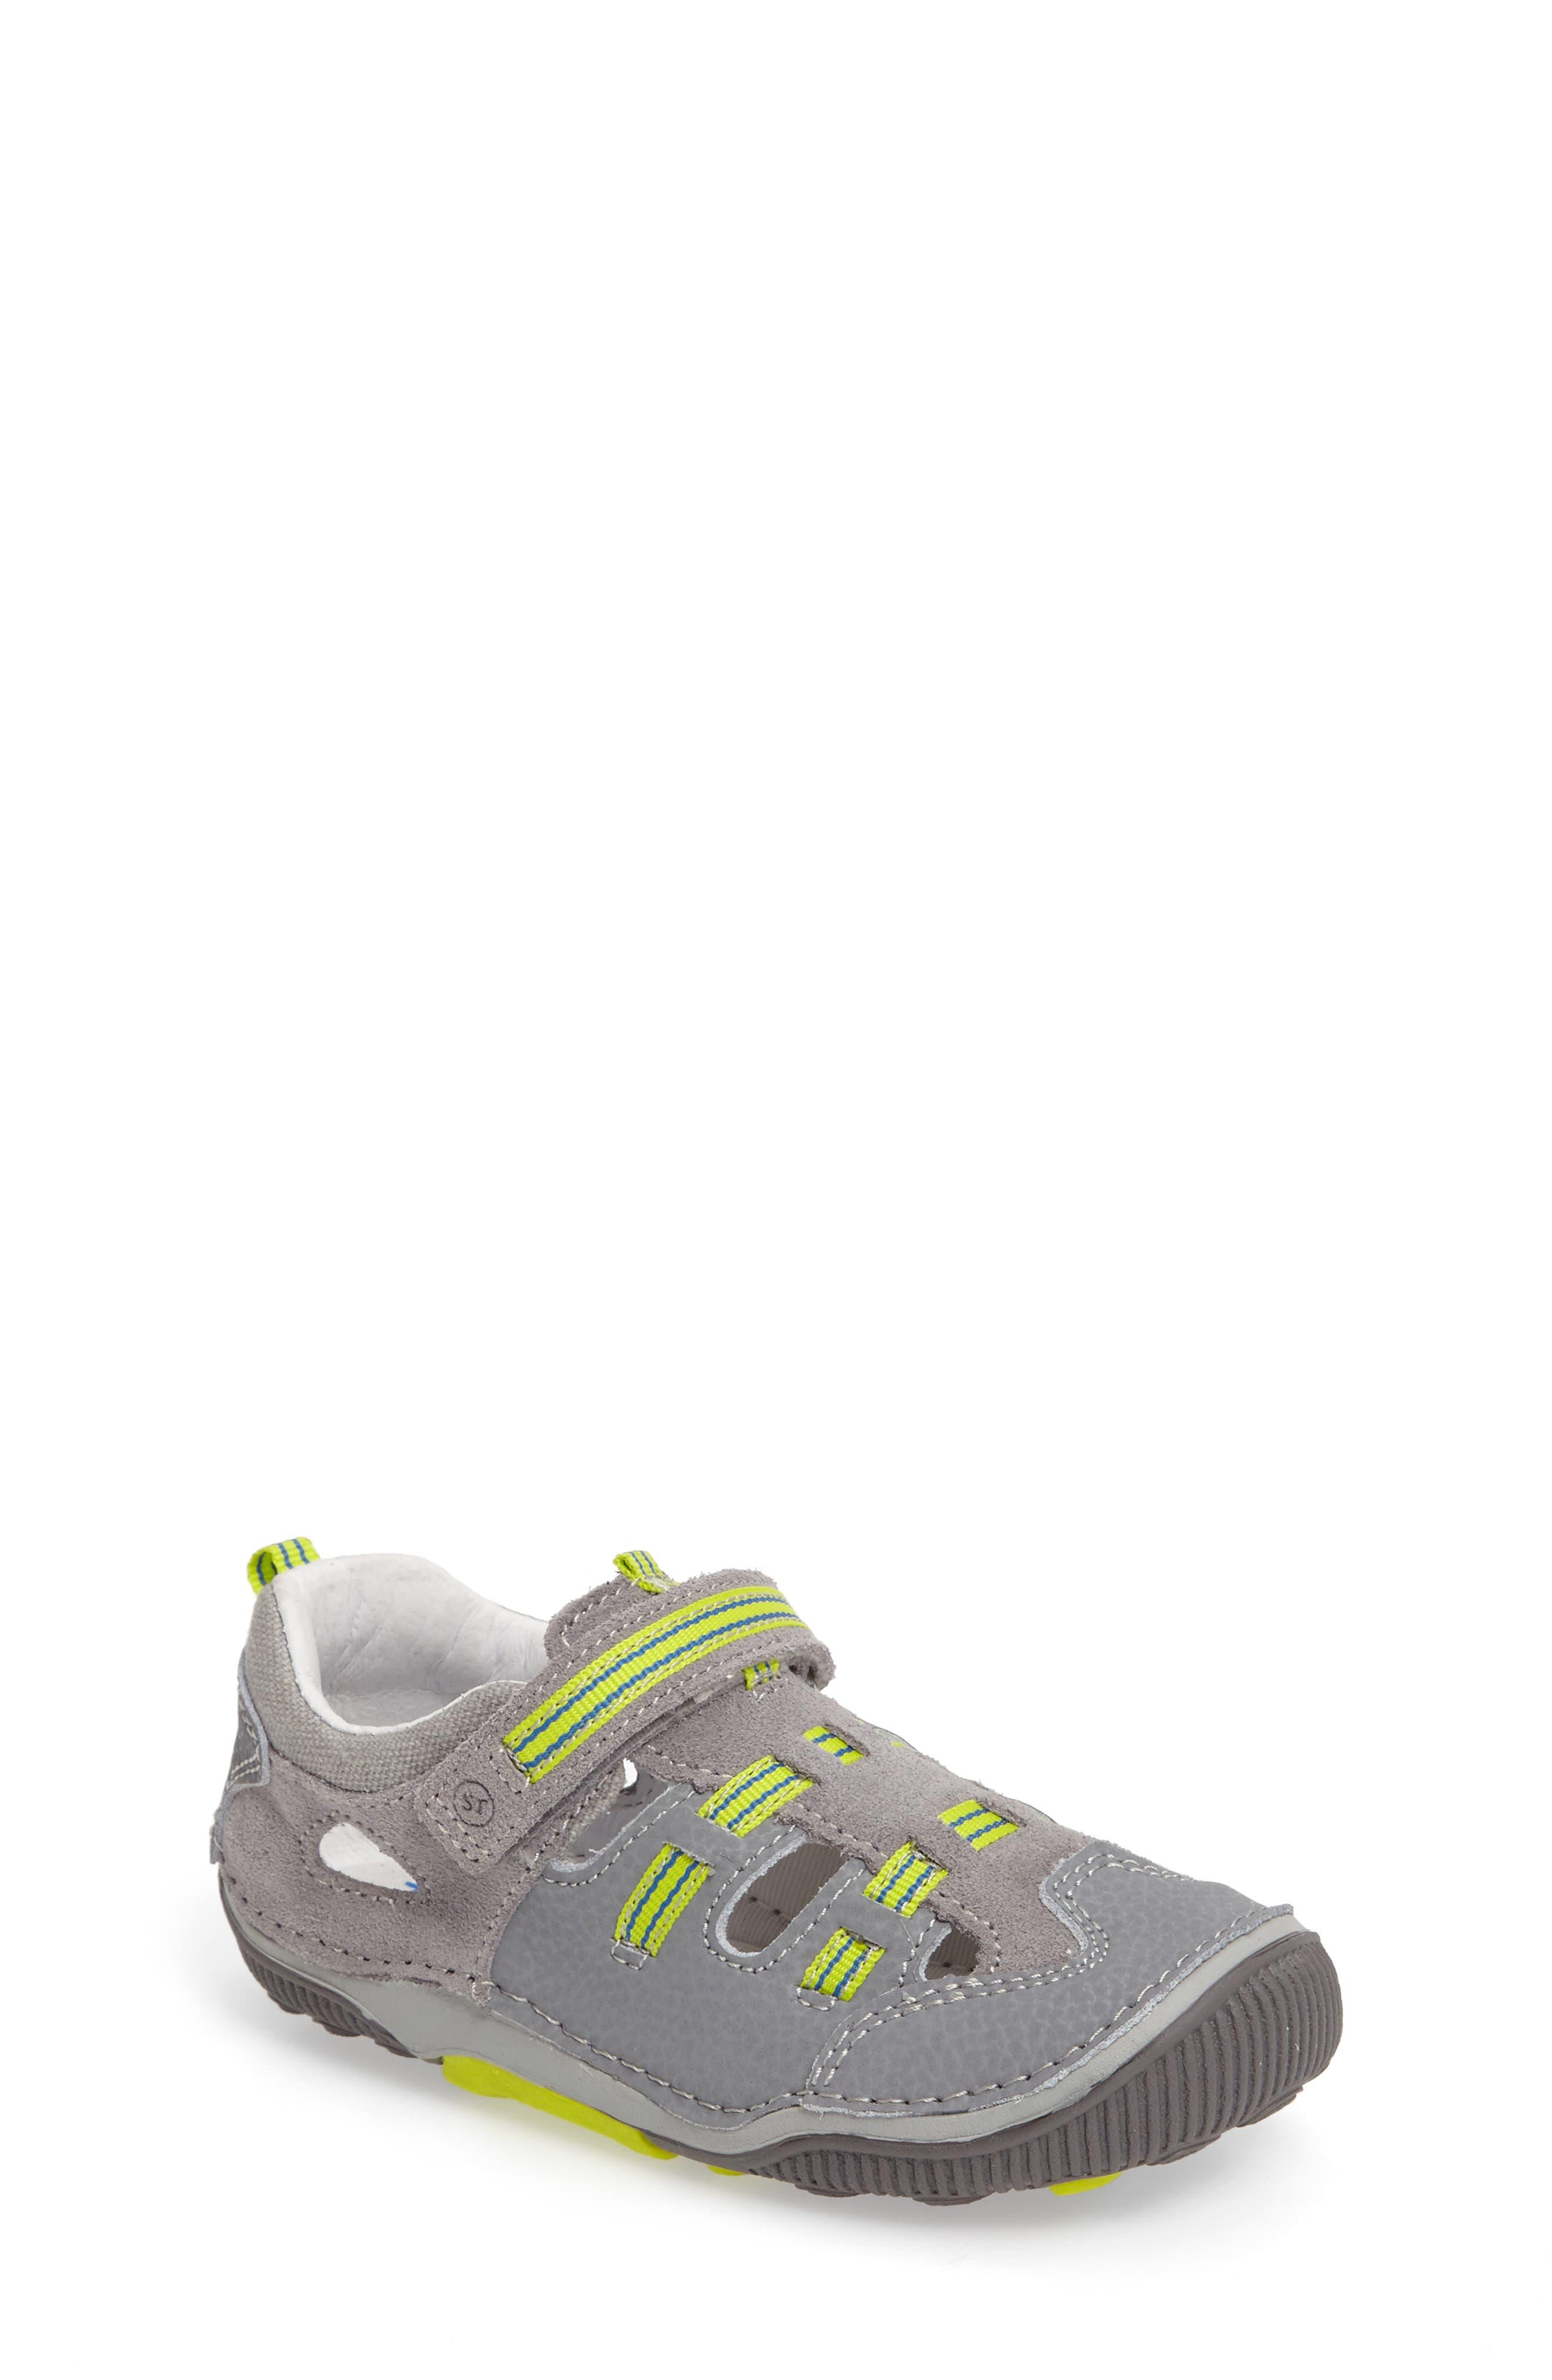 Reggie Cutout Sneaker,                         Main,                         color, 020